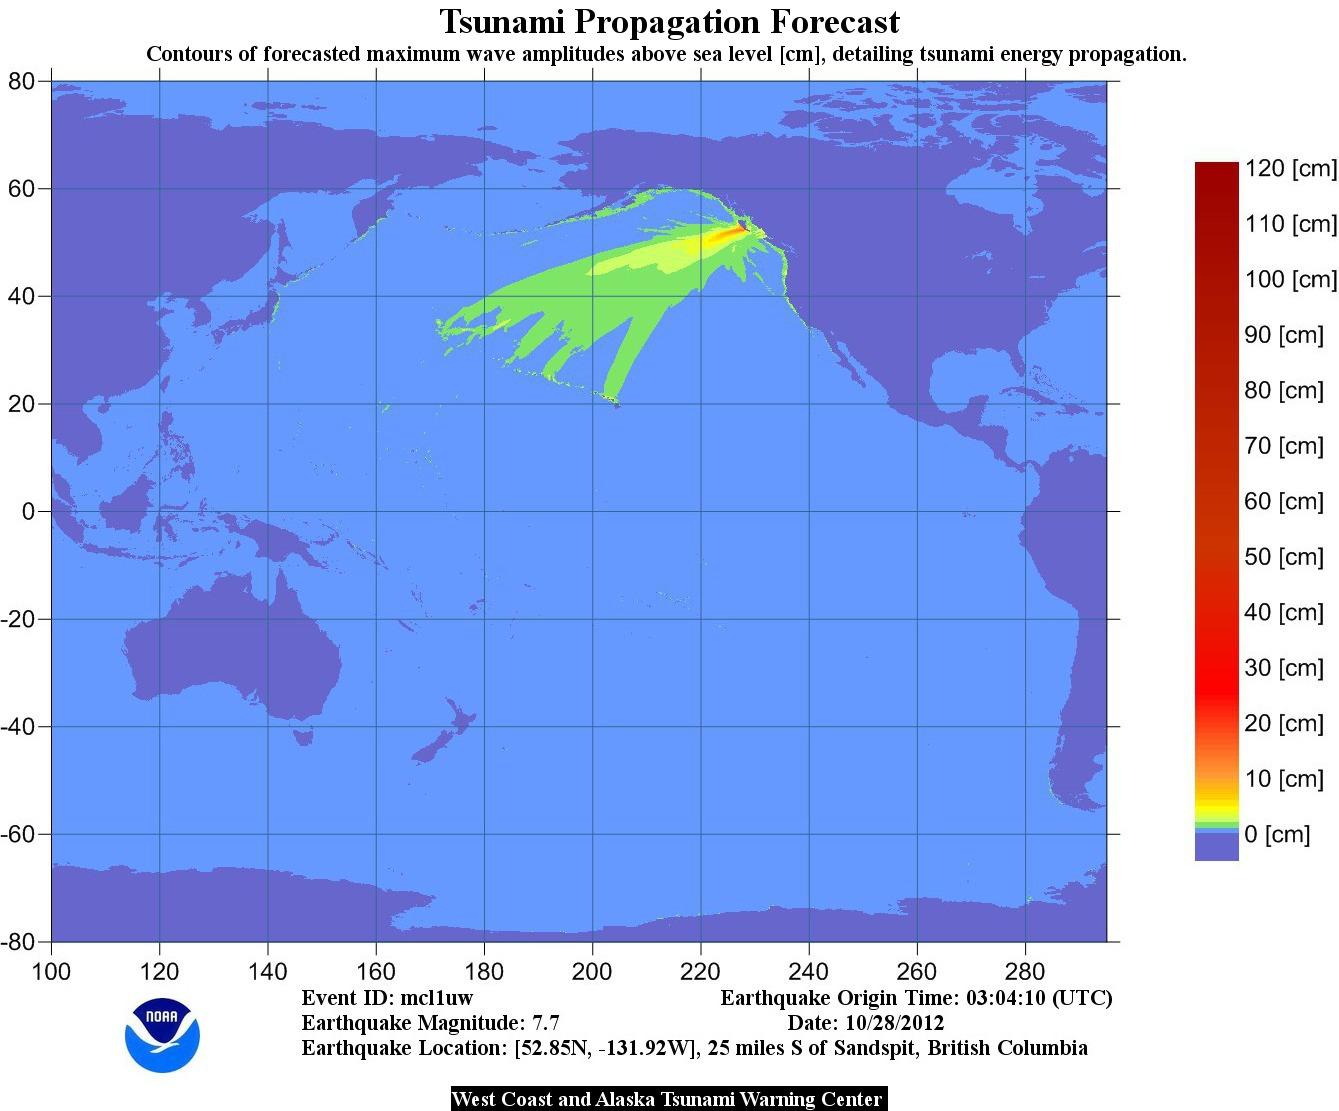 Tsunami Propogation Chart - October 28, 2012. Earthquakes from Haida Gwaii.